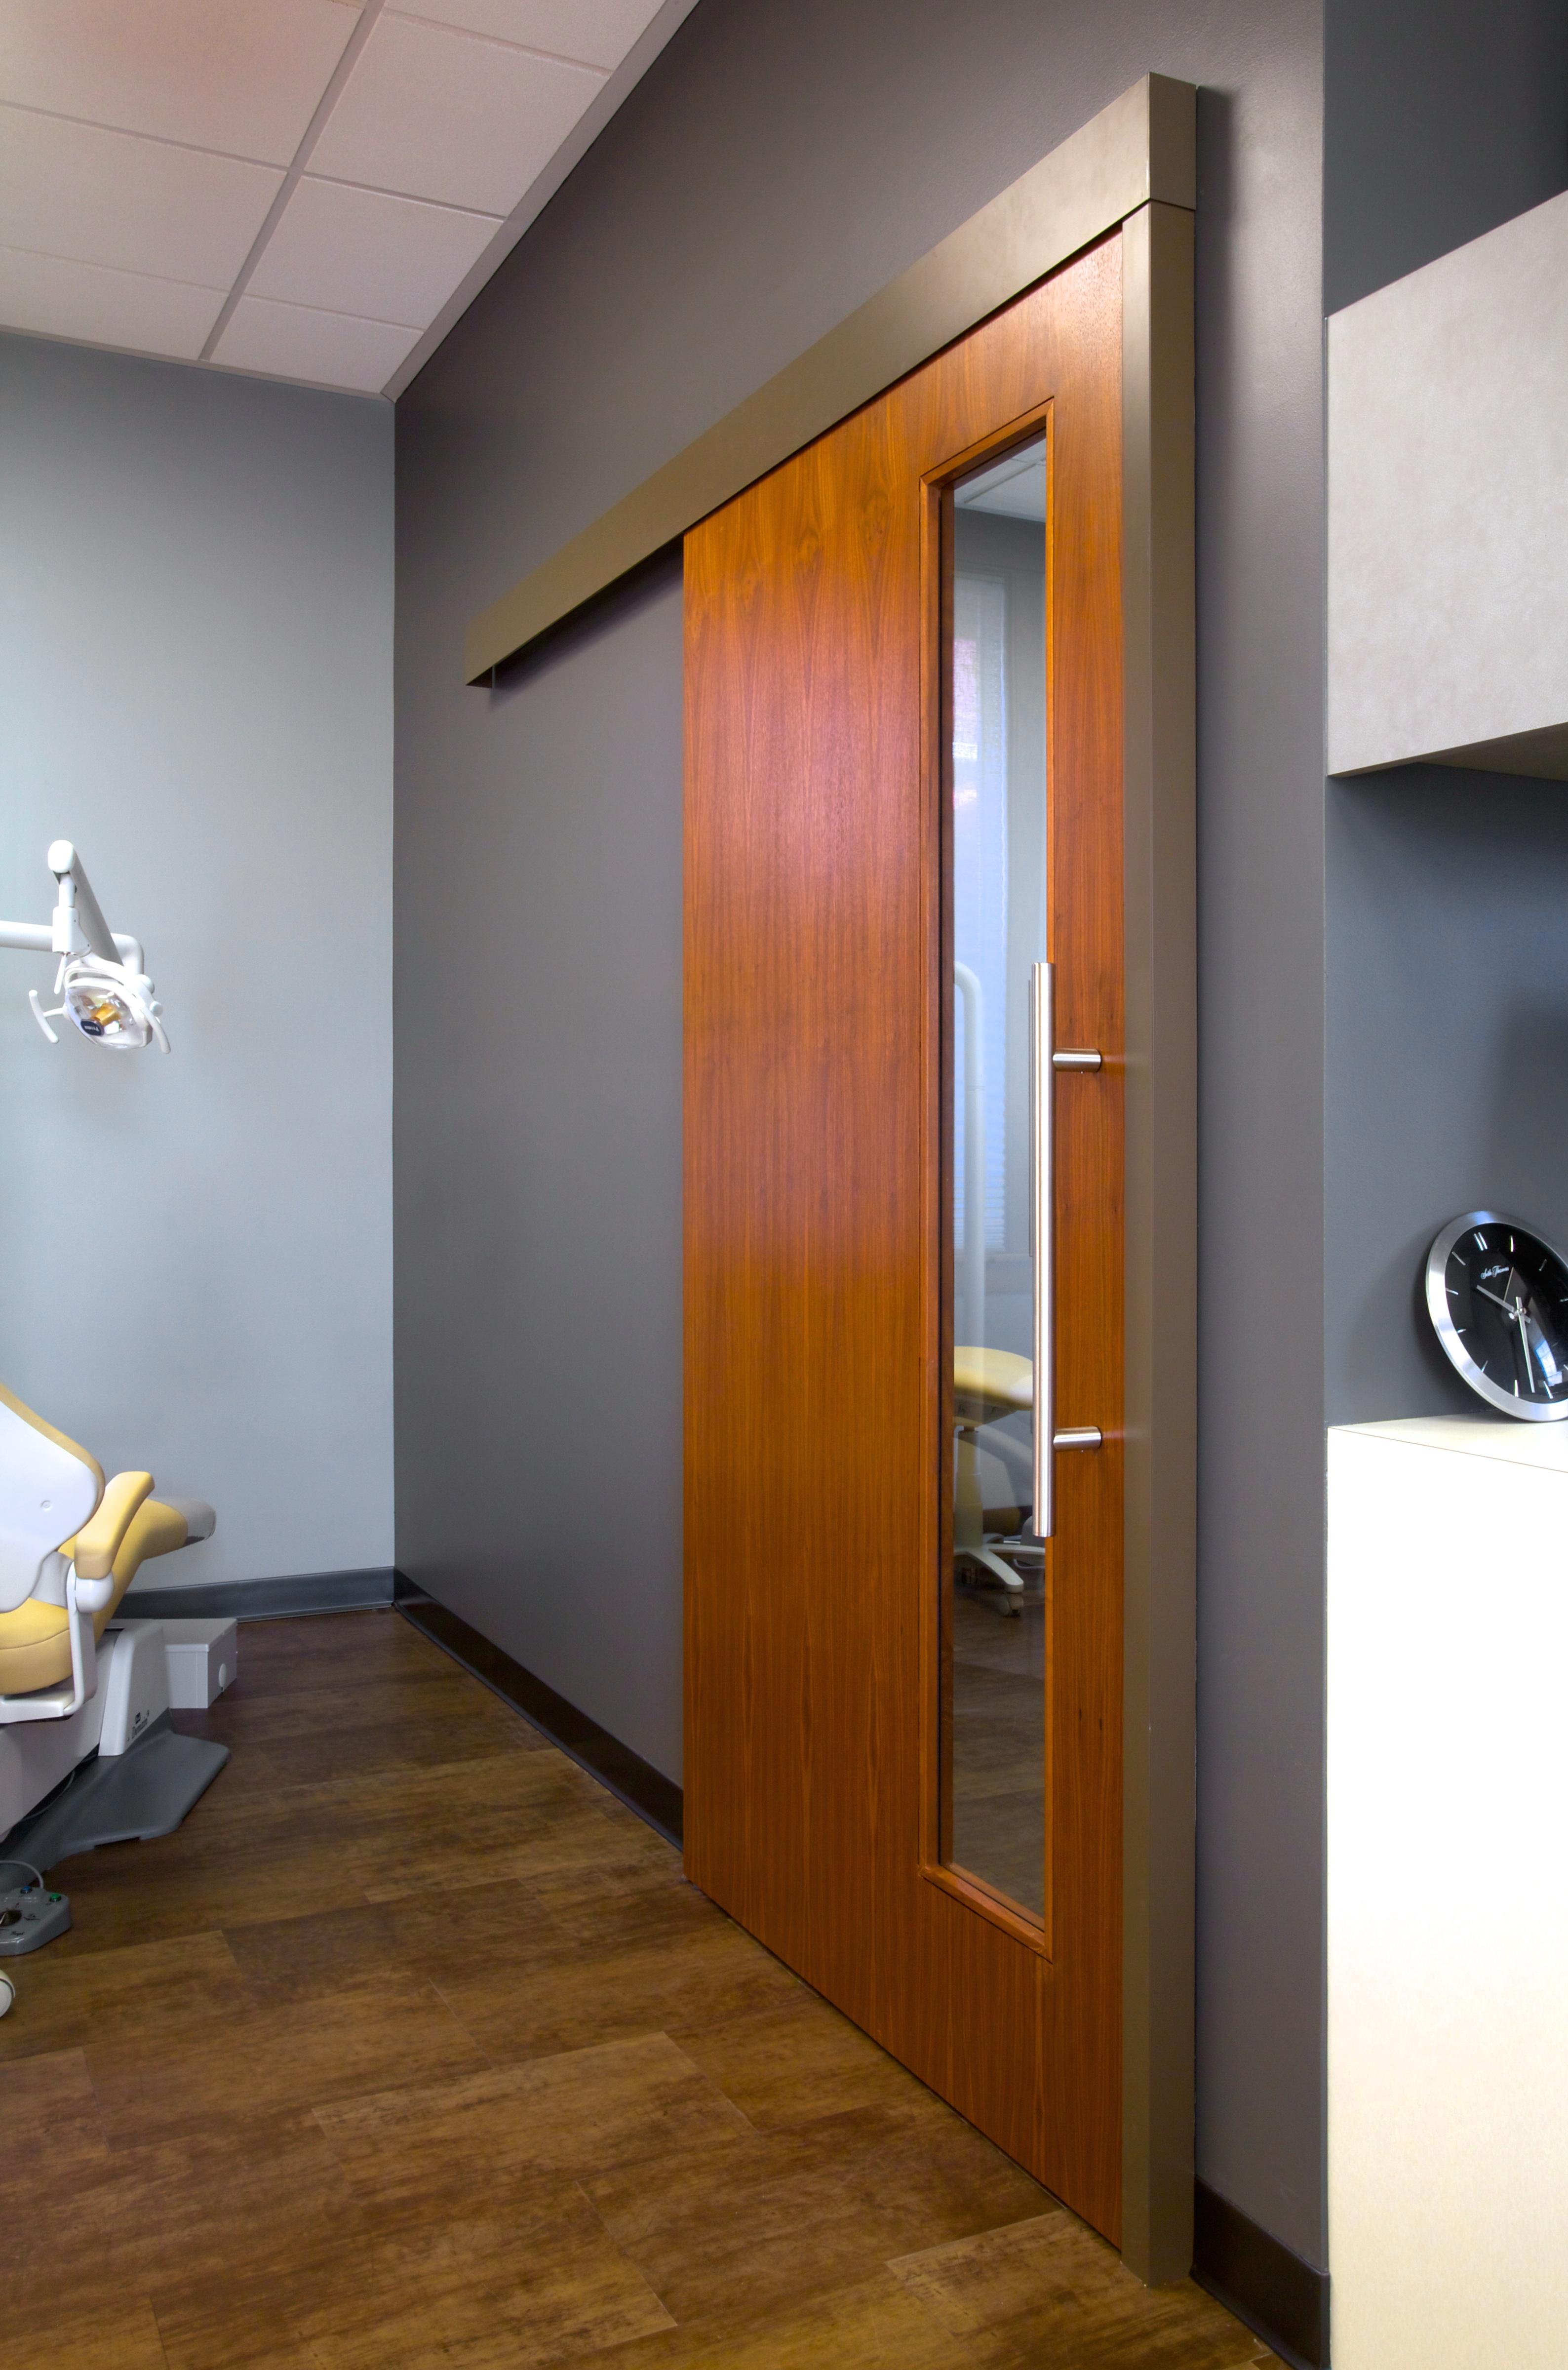 room doors aurora barn doors exam room sliding doors. Black Bedroom Furniture Sets. Home Design Ideas